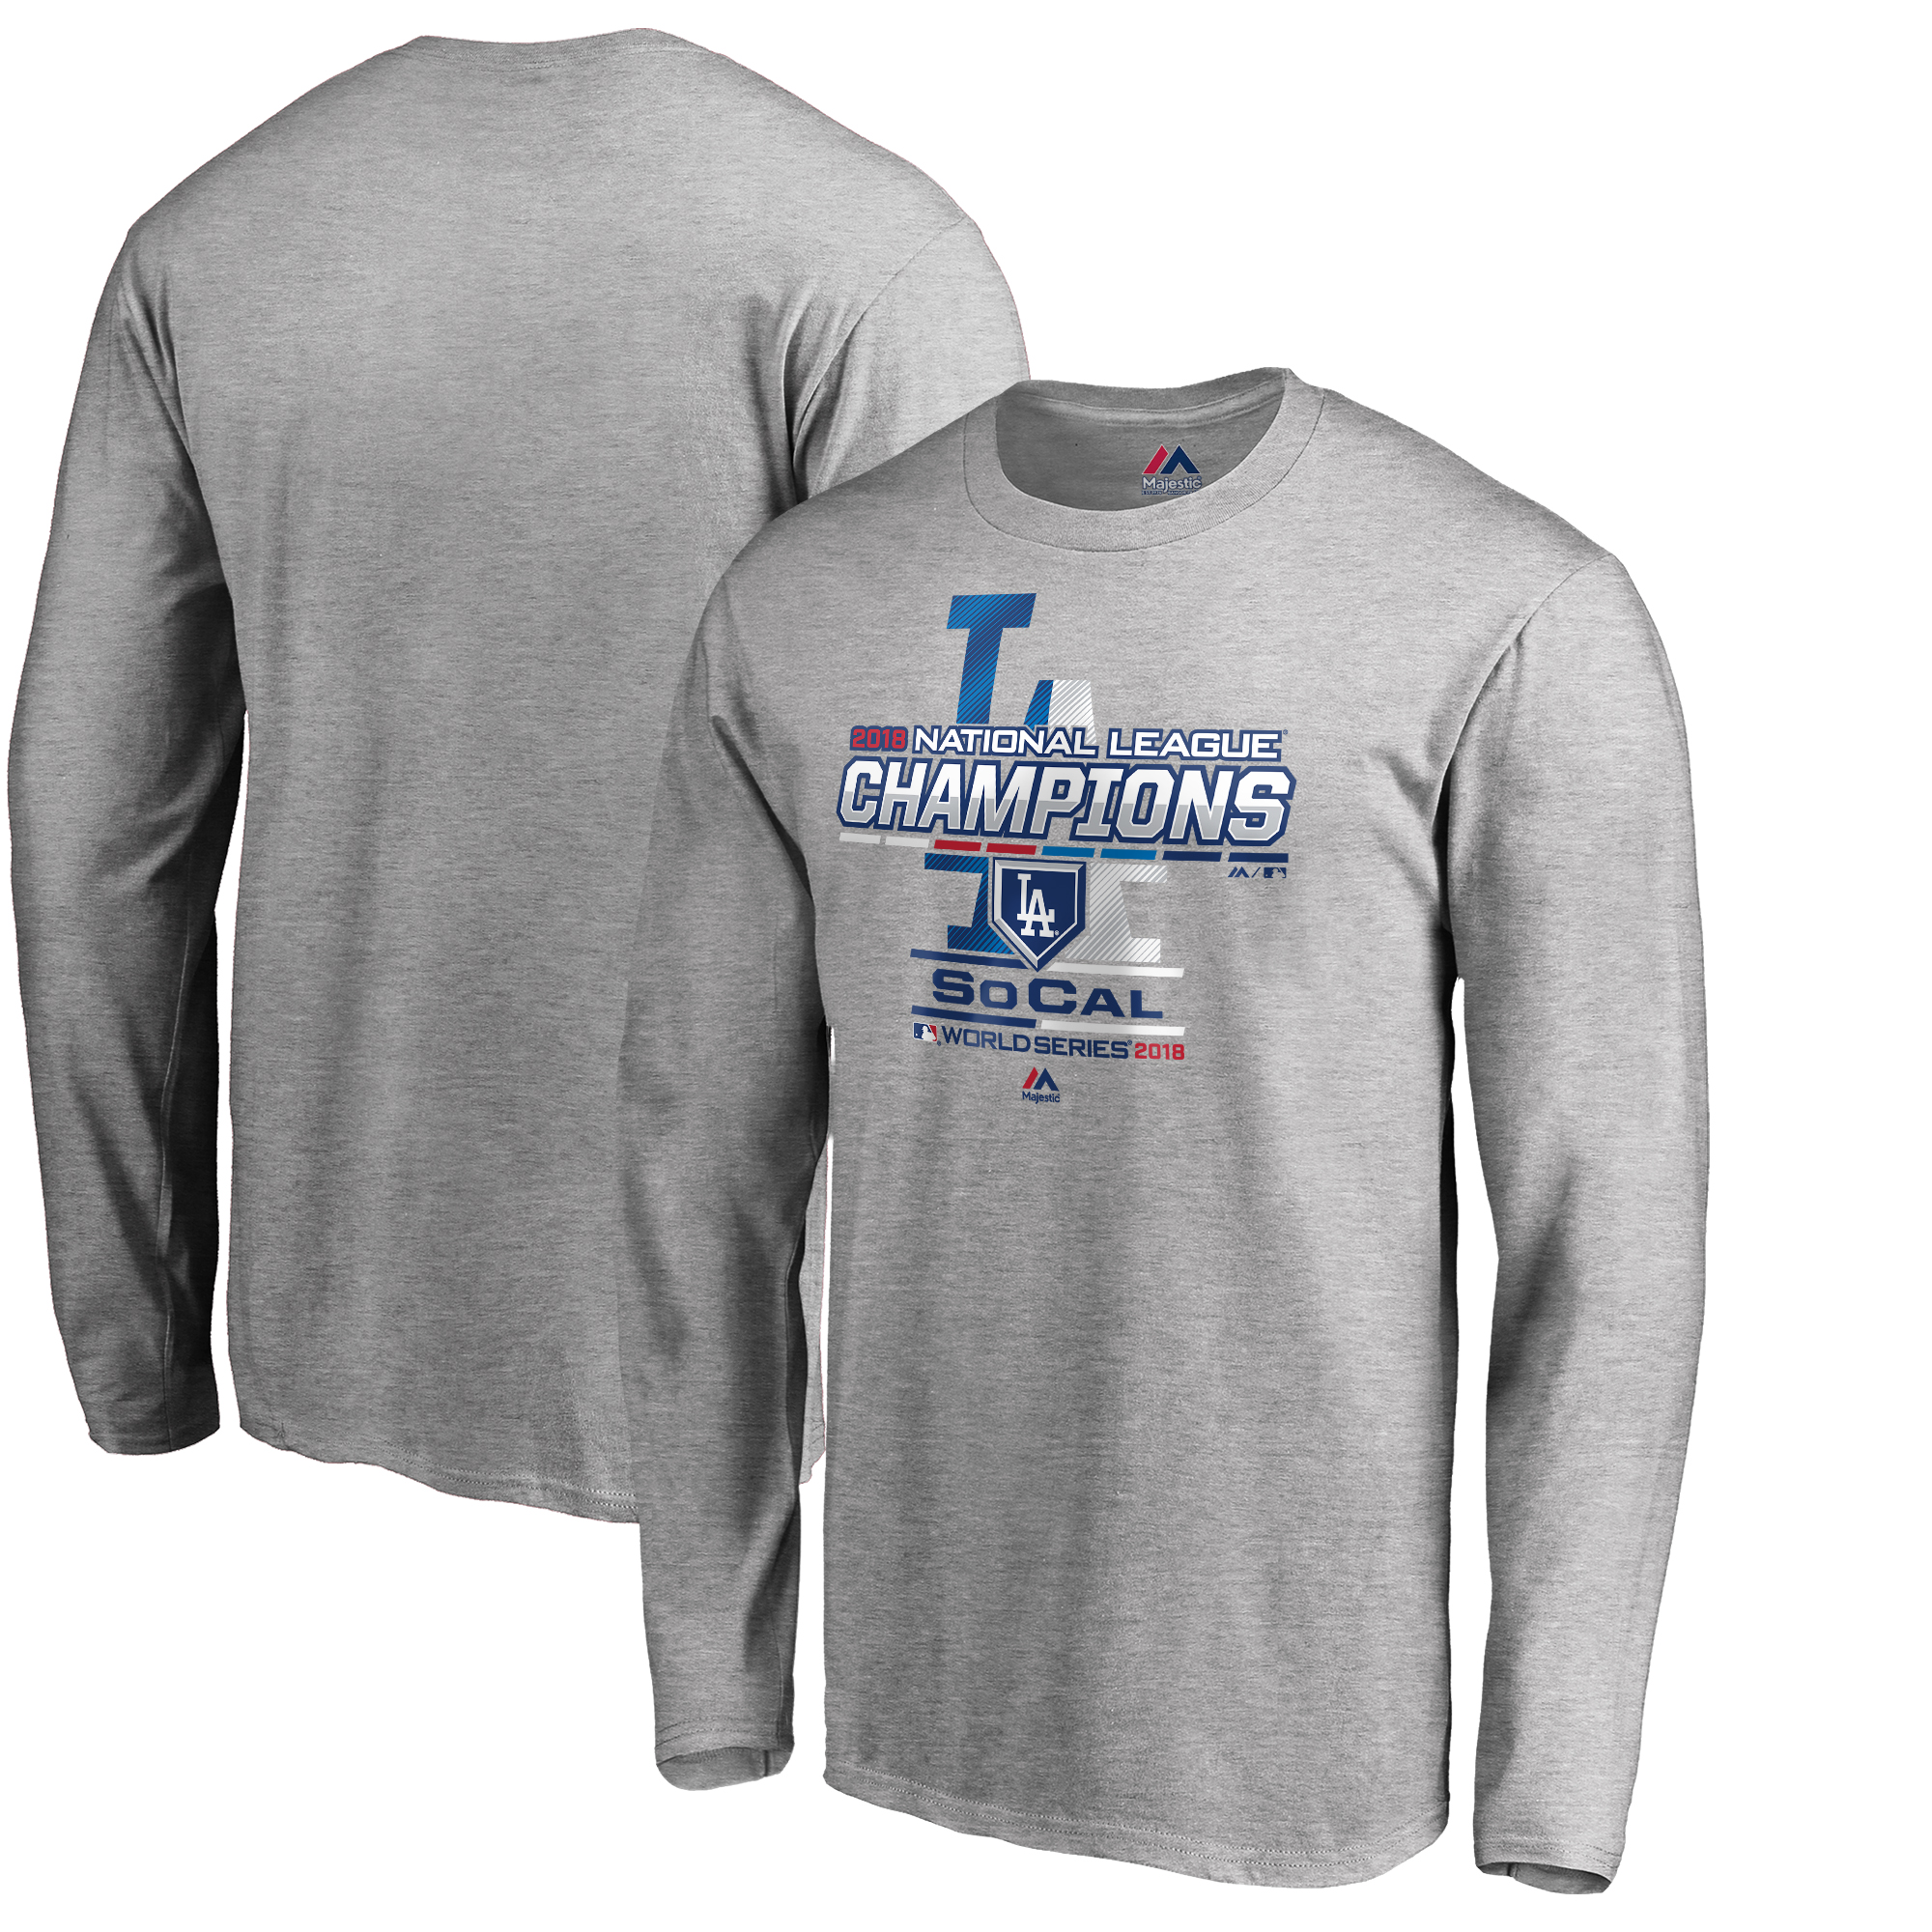 Los Angeles Dodgers Majestic 2018 National League Champions Locker Room Long Sleeve T-Shirt - Heather Gray